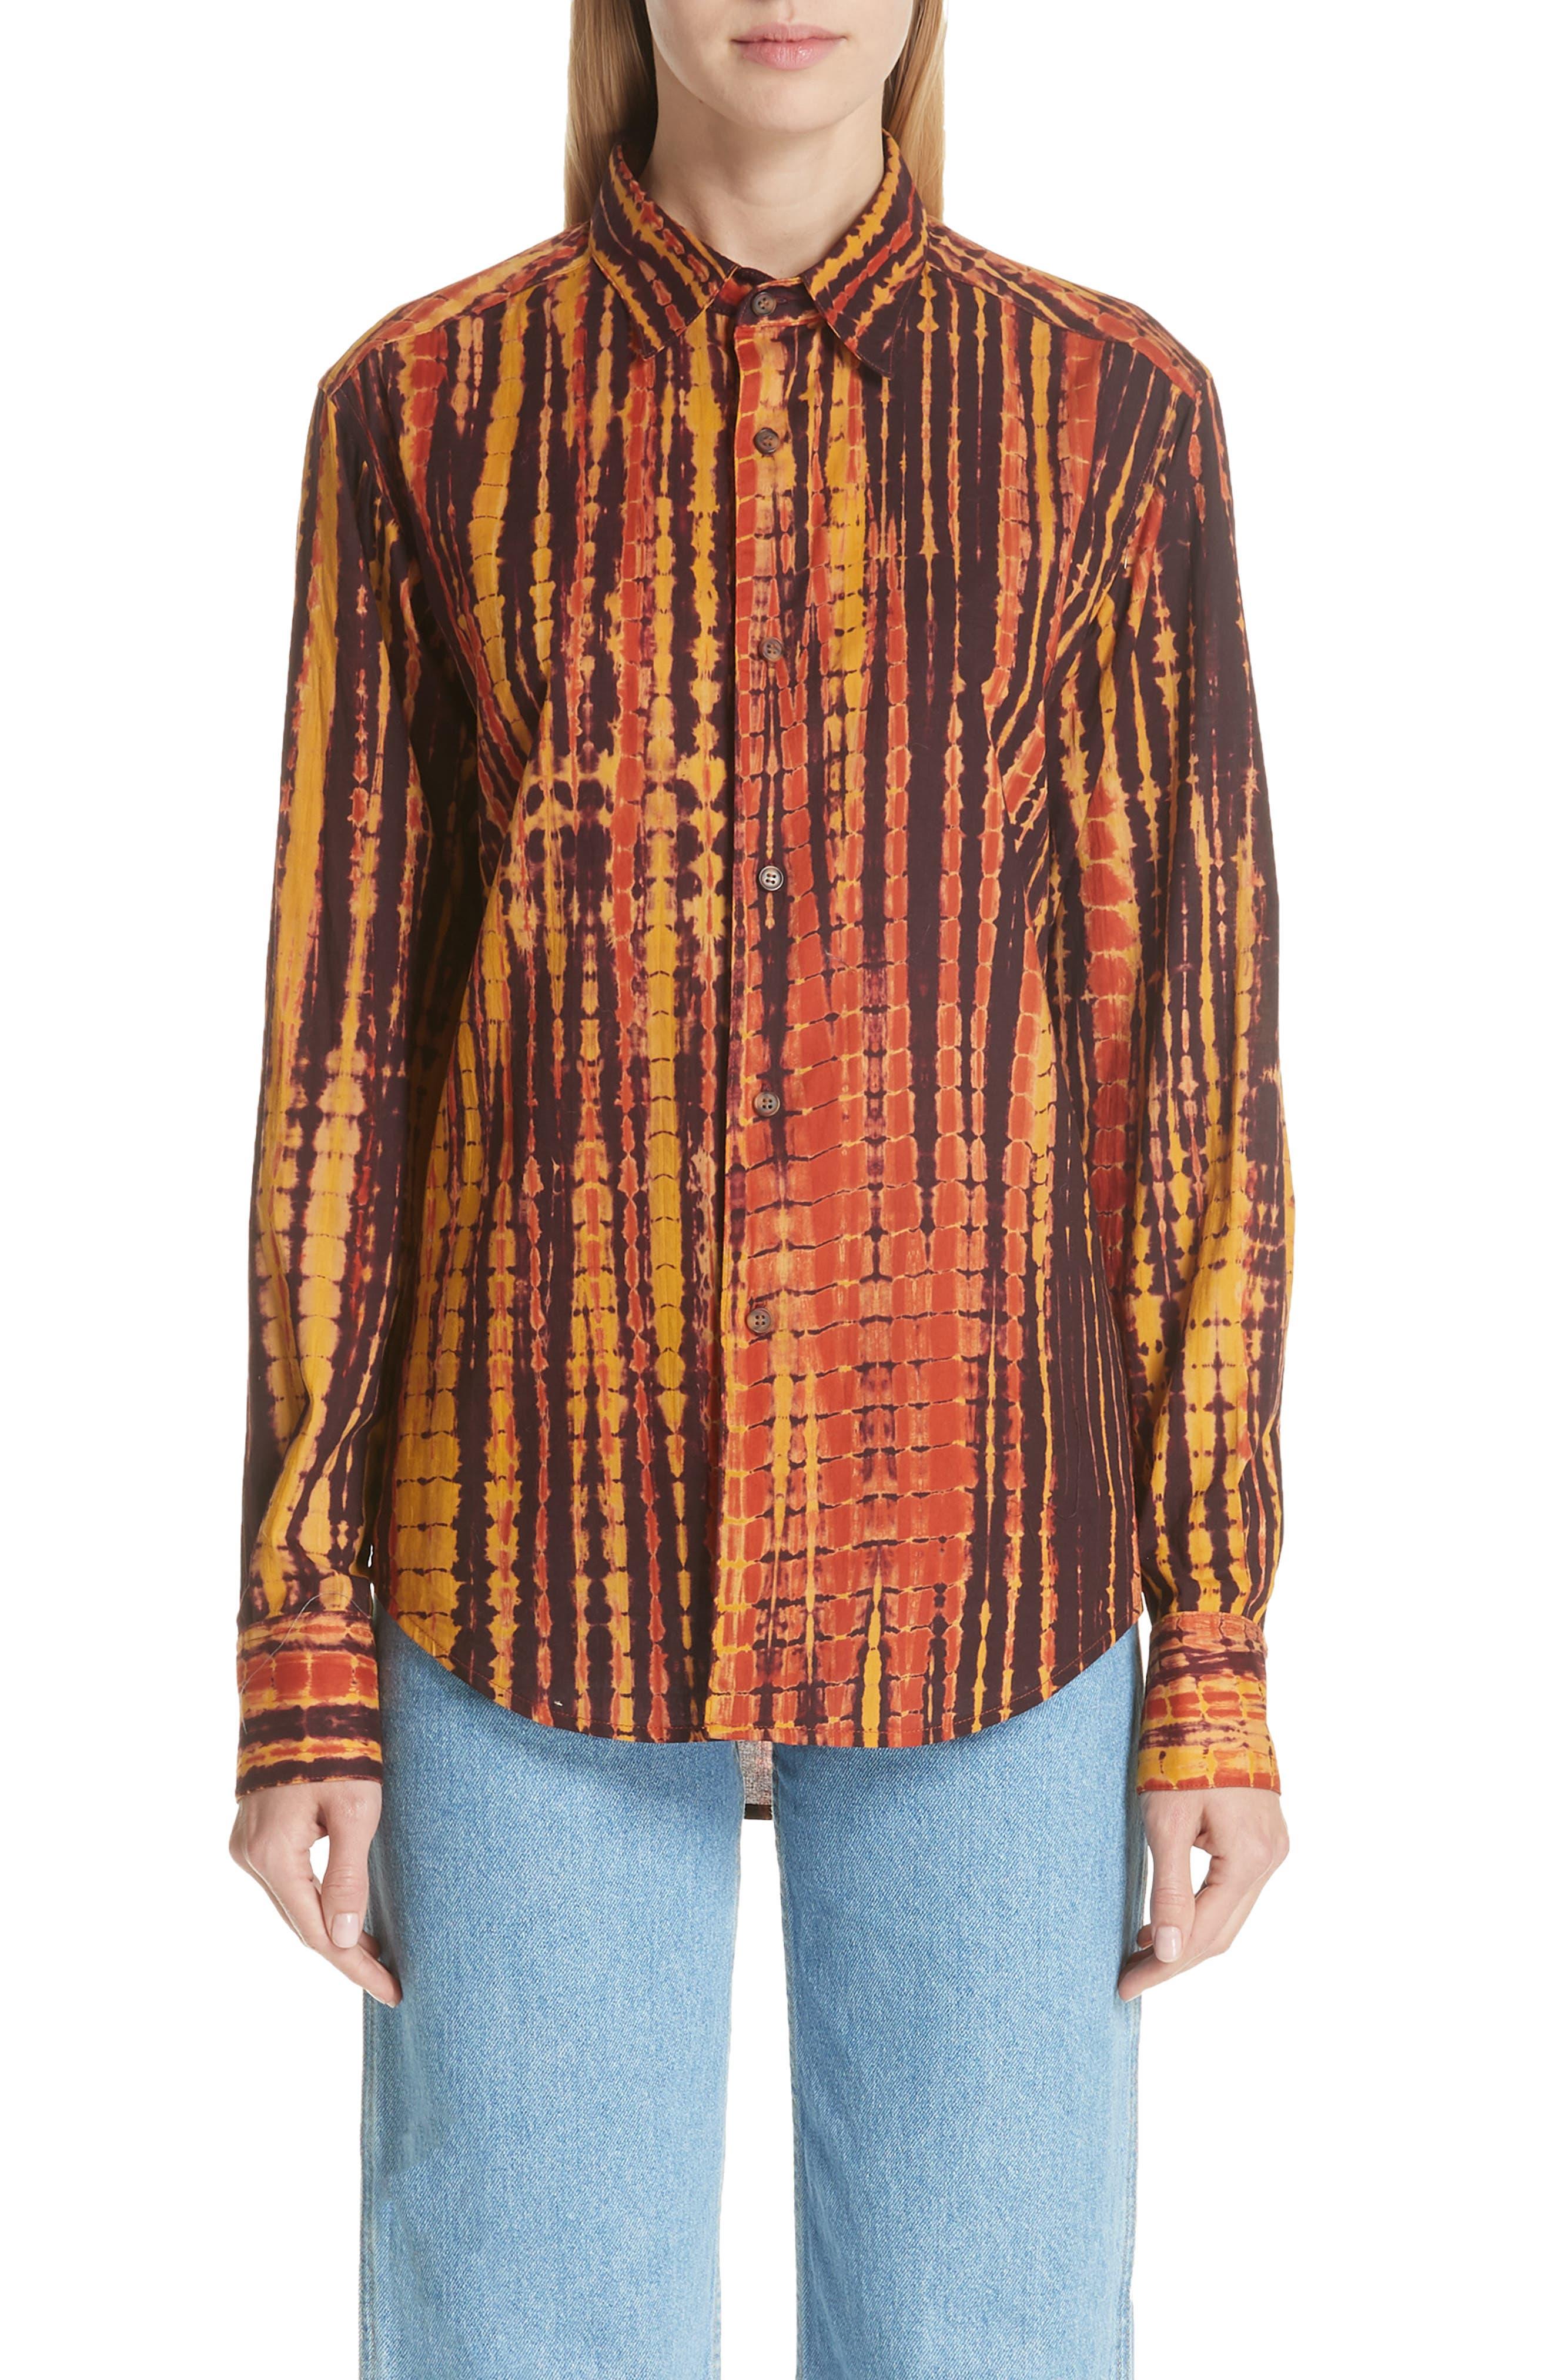 ECKHAUS LATTA Hand Dyed Cotton Shirt, Main, color, 200